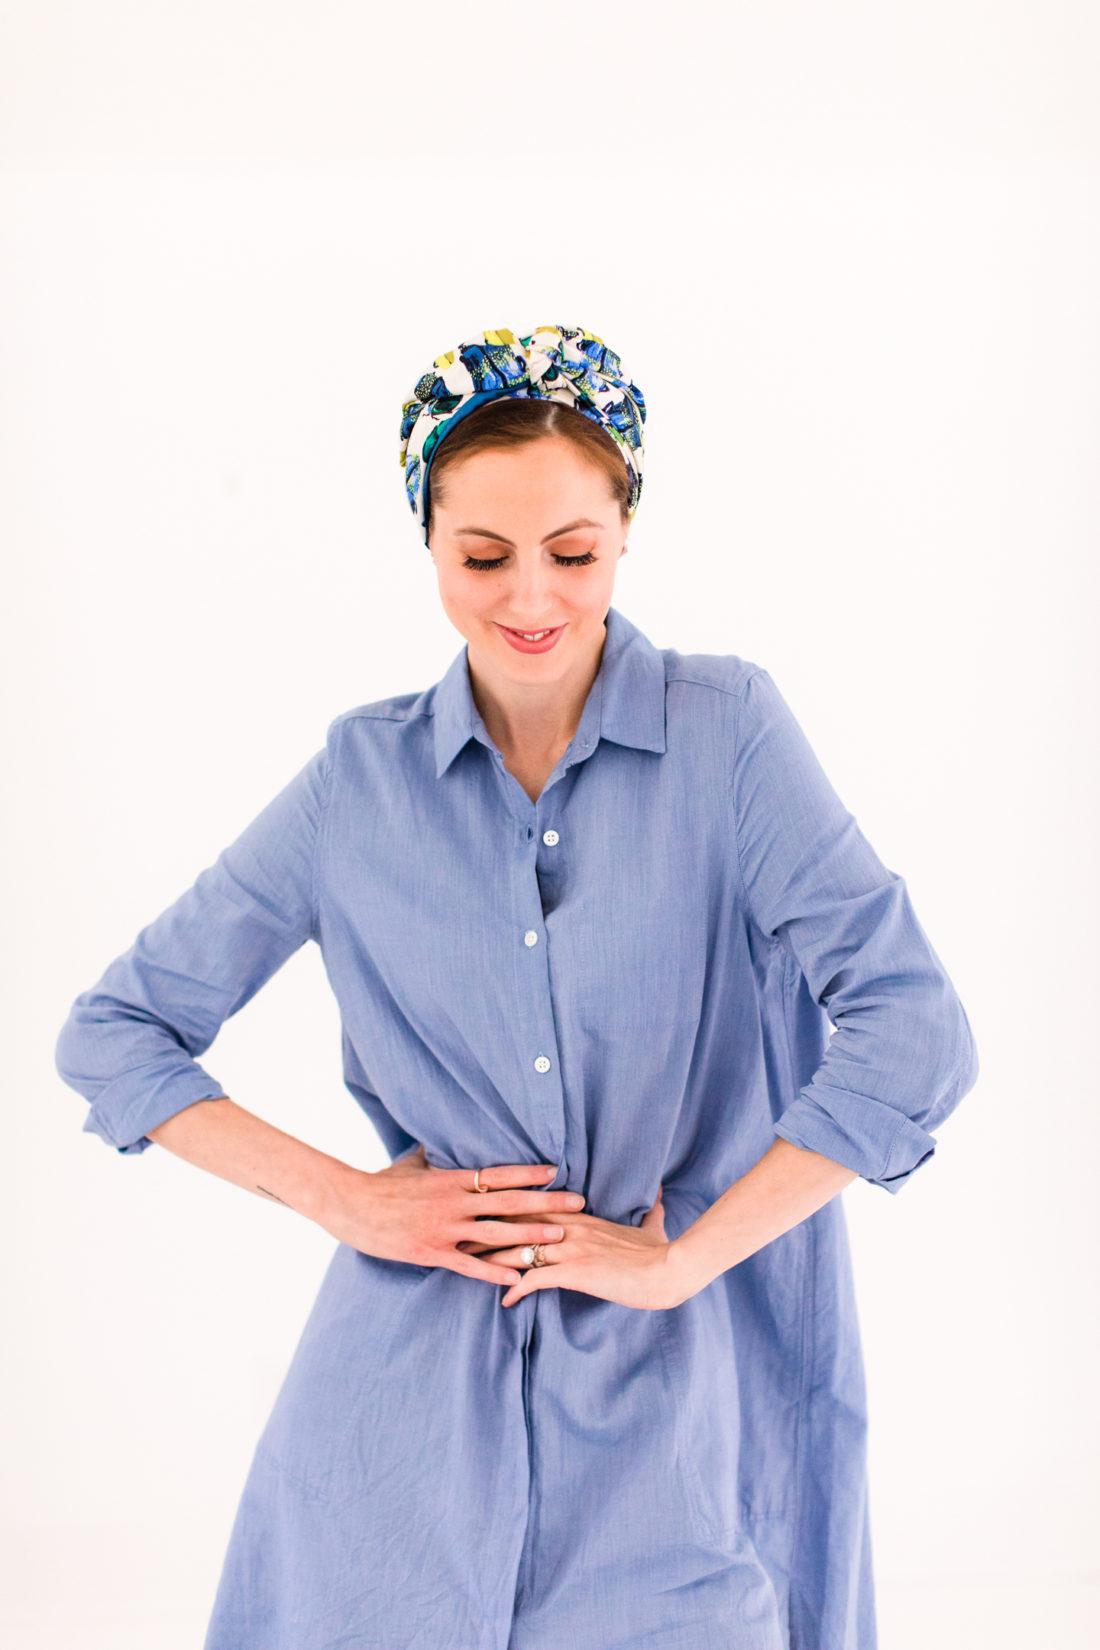 Eva Amurri Martino wears a light blue shirt dress and a turban head wrap made from a knotted silk scarf